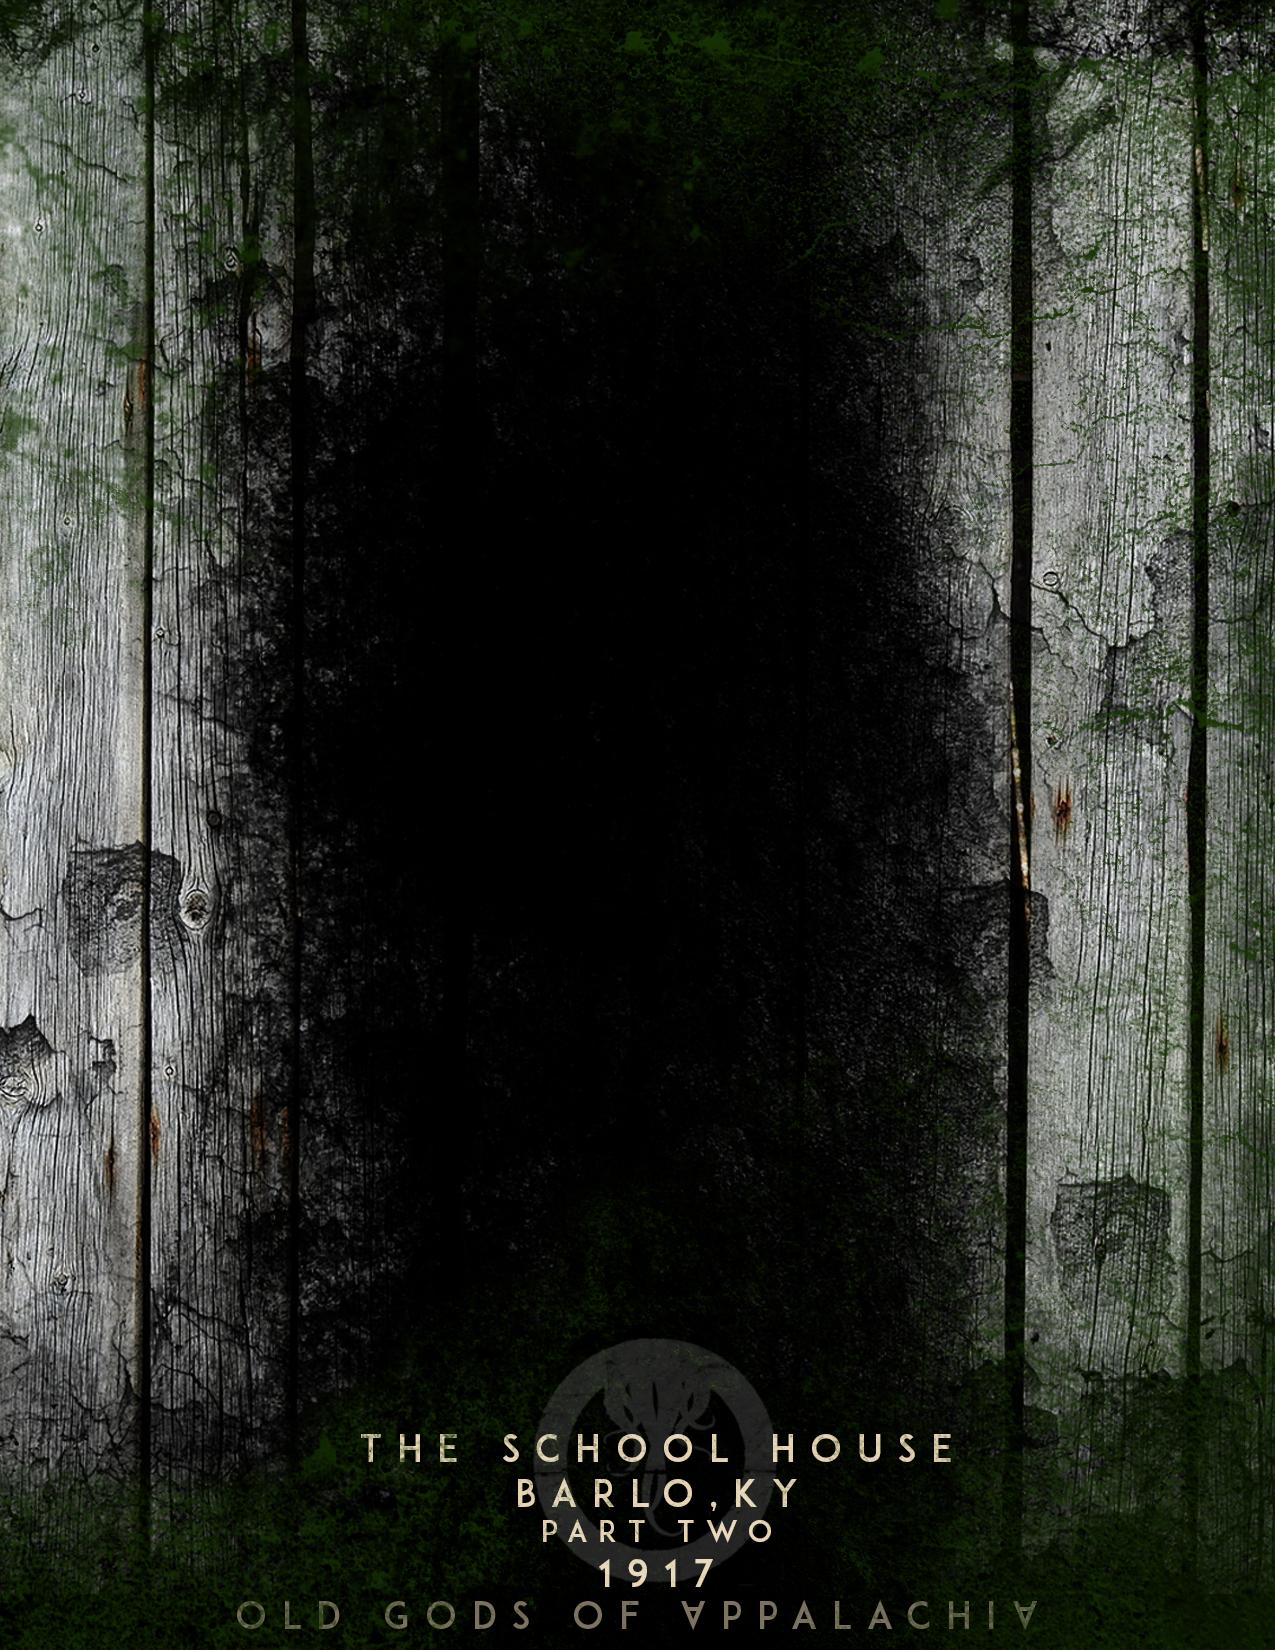 Episode 2: The Schoolhouse: Barlo Kentucky 1917: Part Two